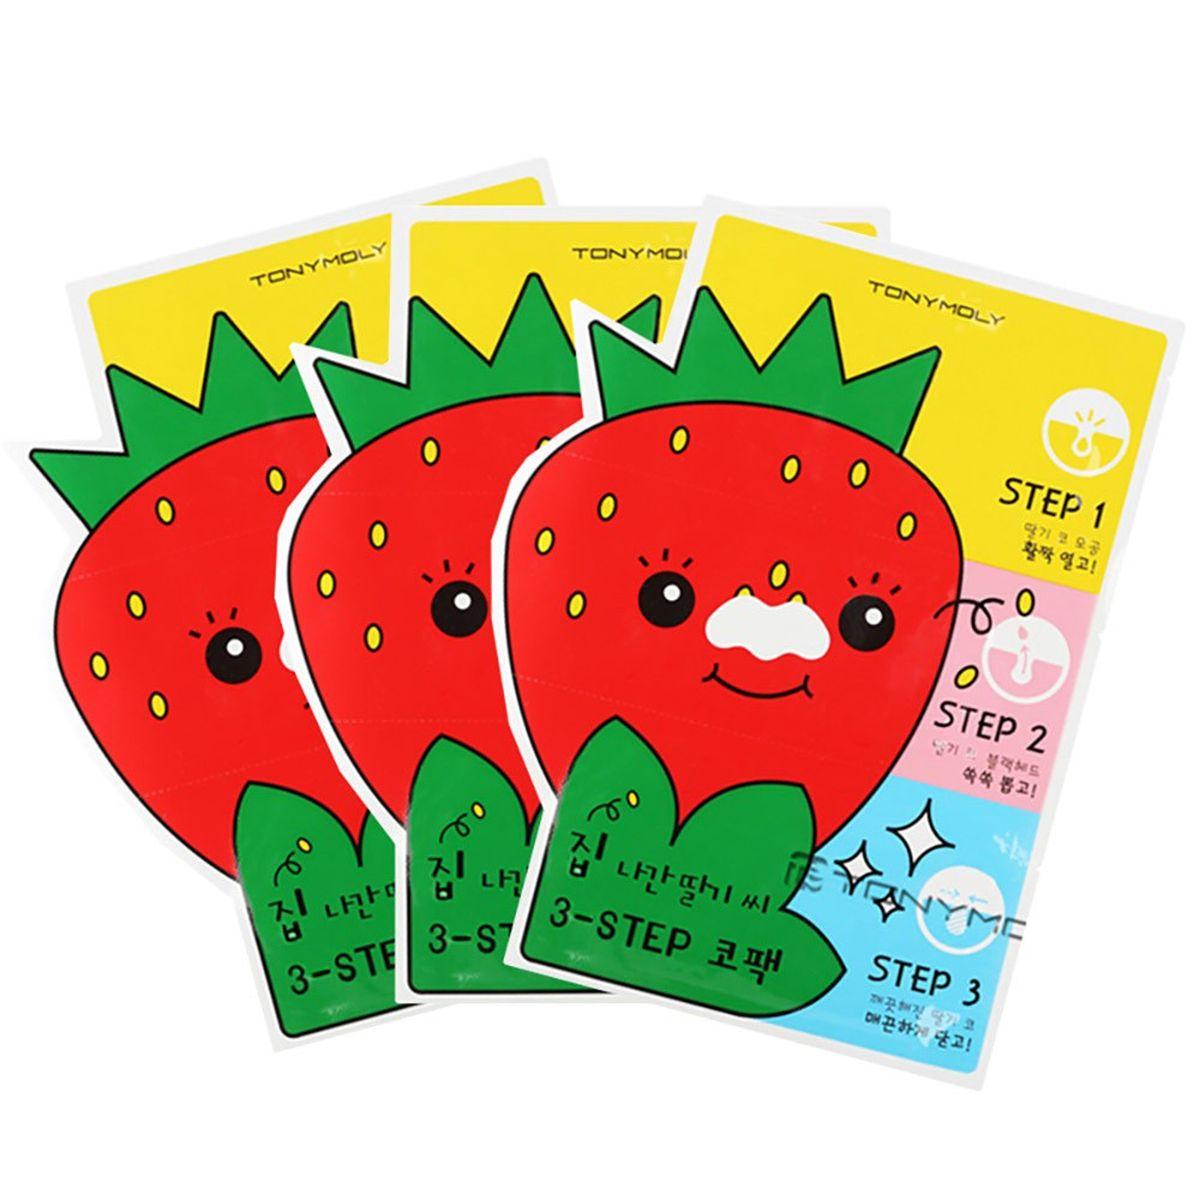 Пластыри от черных точек Tony Moly Homeless Strawberry Seeds 3-step Nose Pack